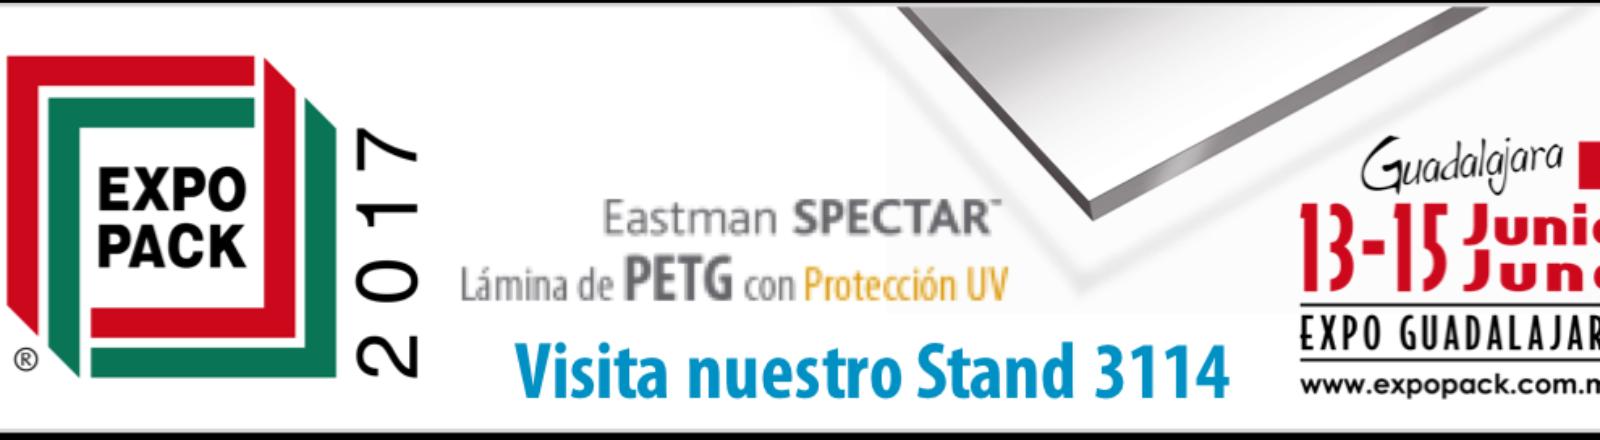 Expopack Lamina de PET G con Protección UV